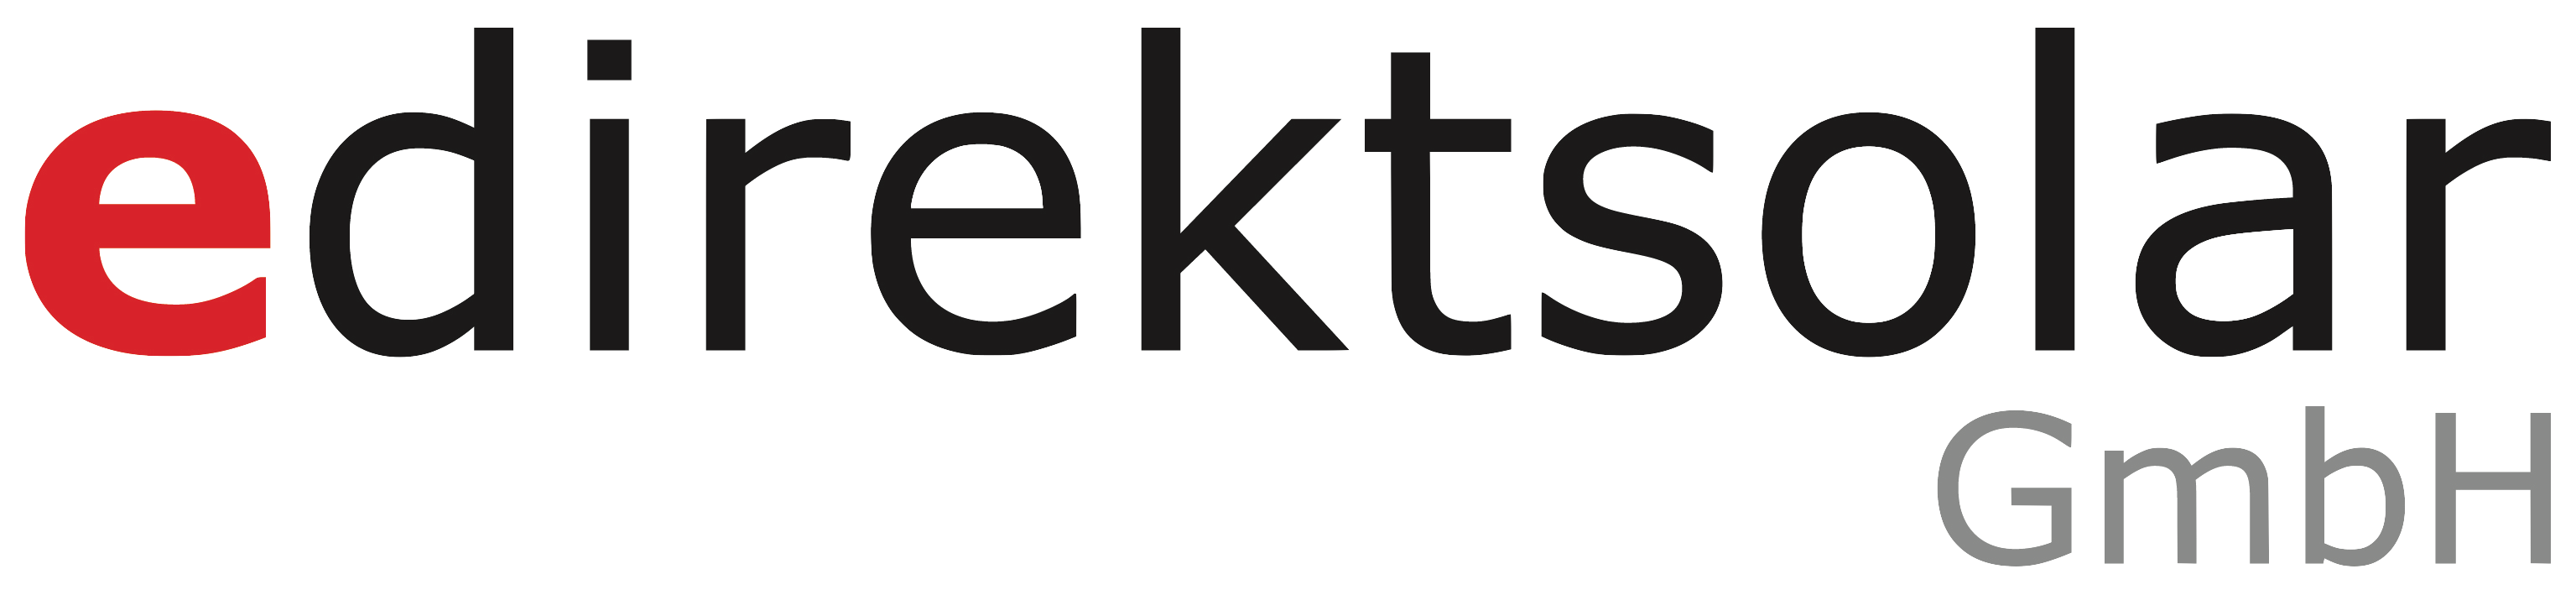 edirektsolar GmbH